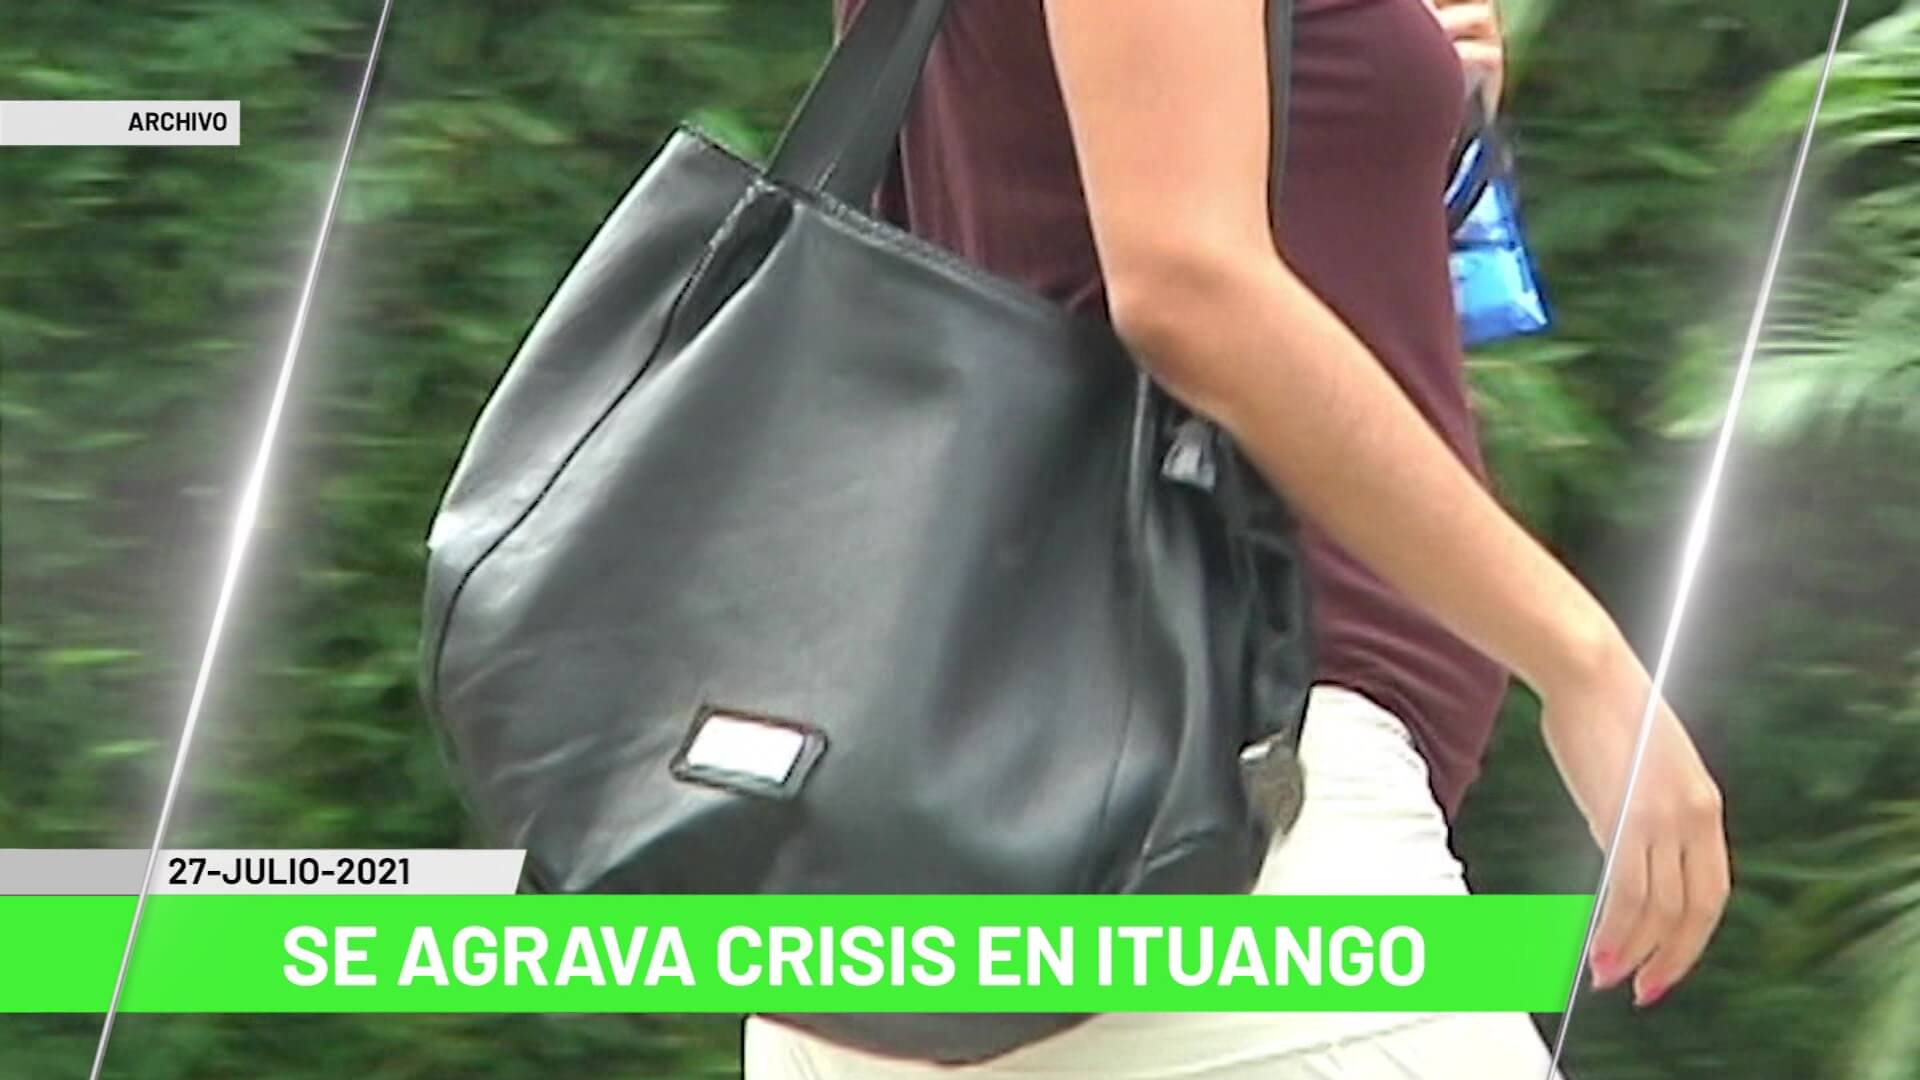 Titulares de Teleantioquia Noticias – martes 27 de julio de 2021